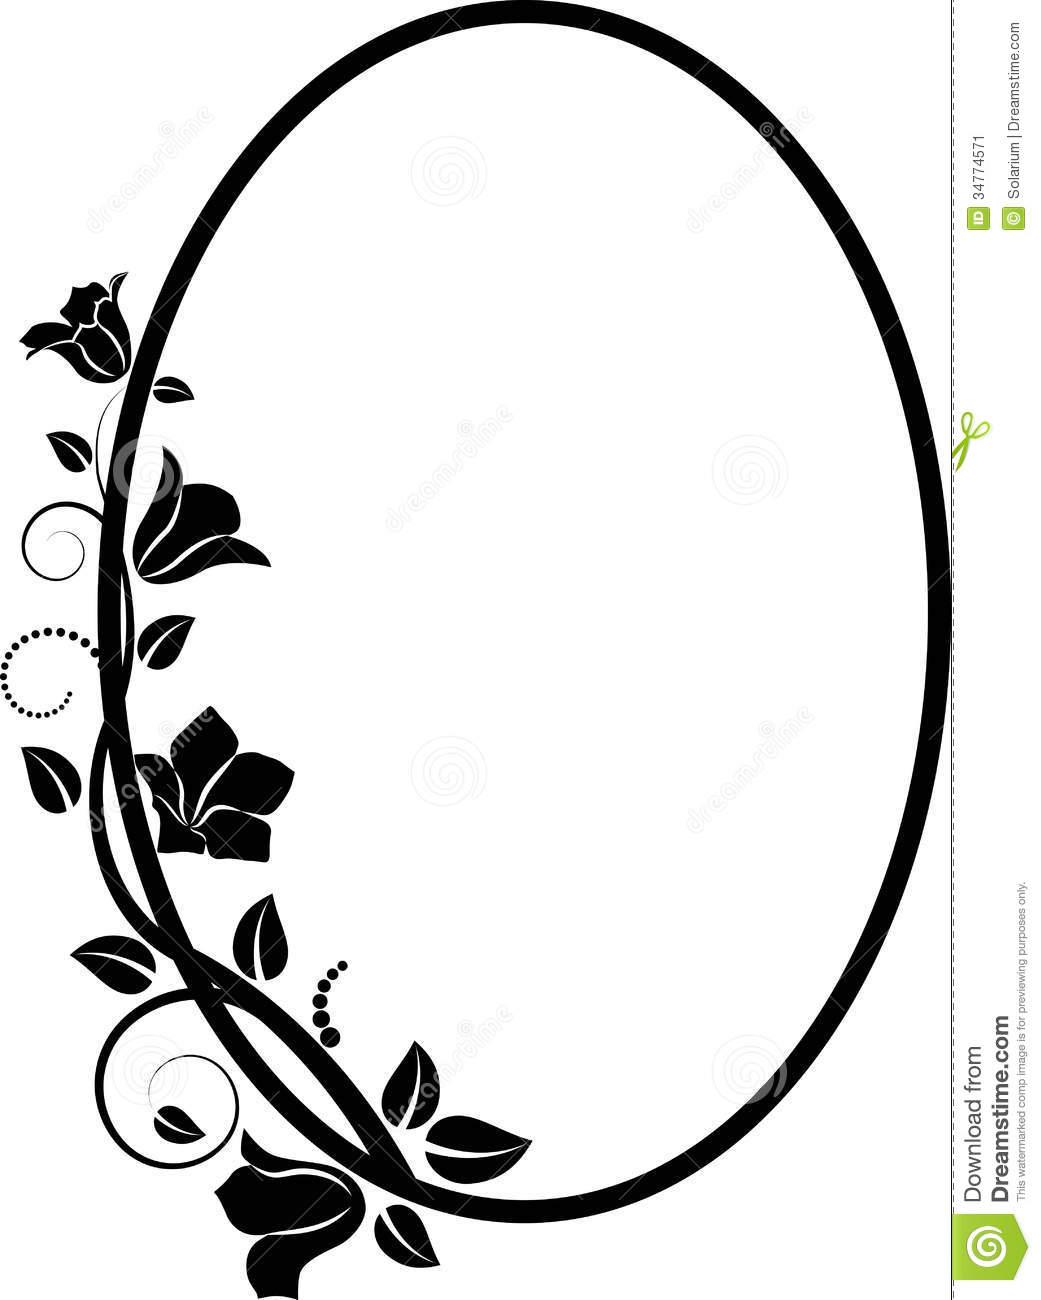 Flower Frame Line Drawing : Black oval frame clipart suggest